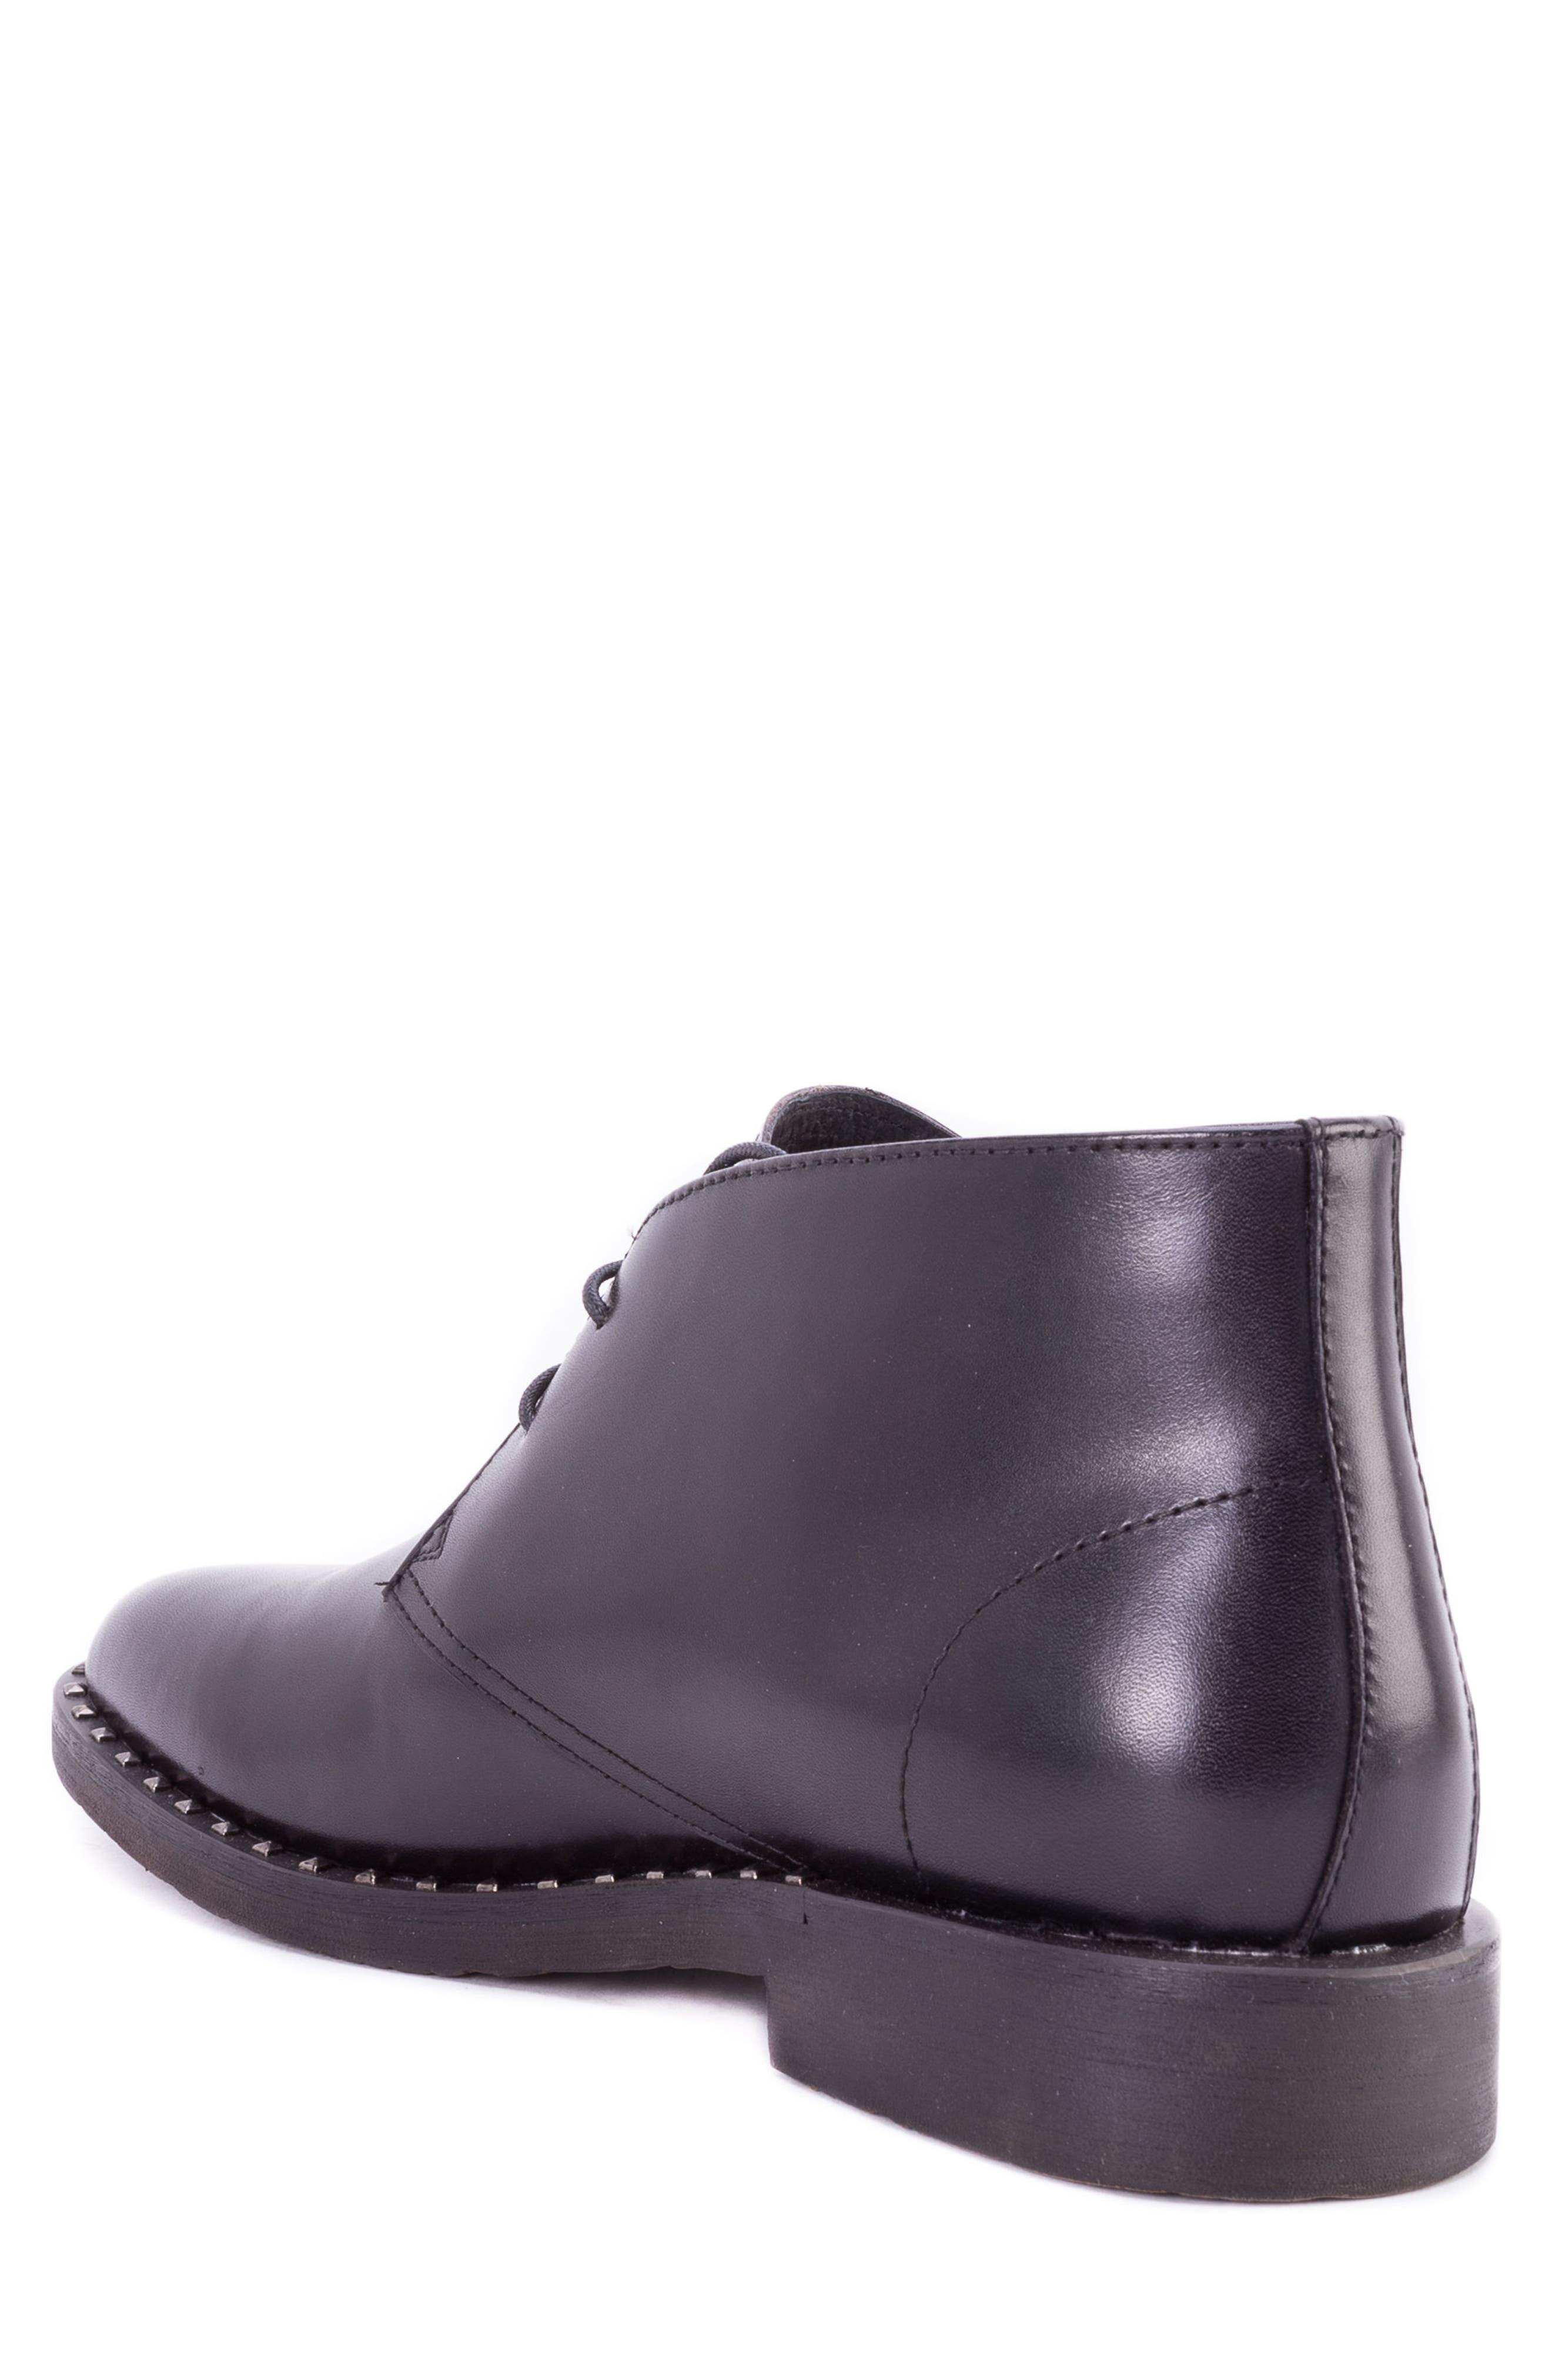 Norrie Studded Chukka Boot,                             Alternate thumbnail 2, color,                             BLACK LEATHER